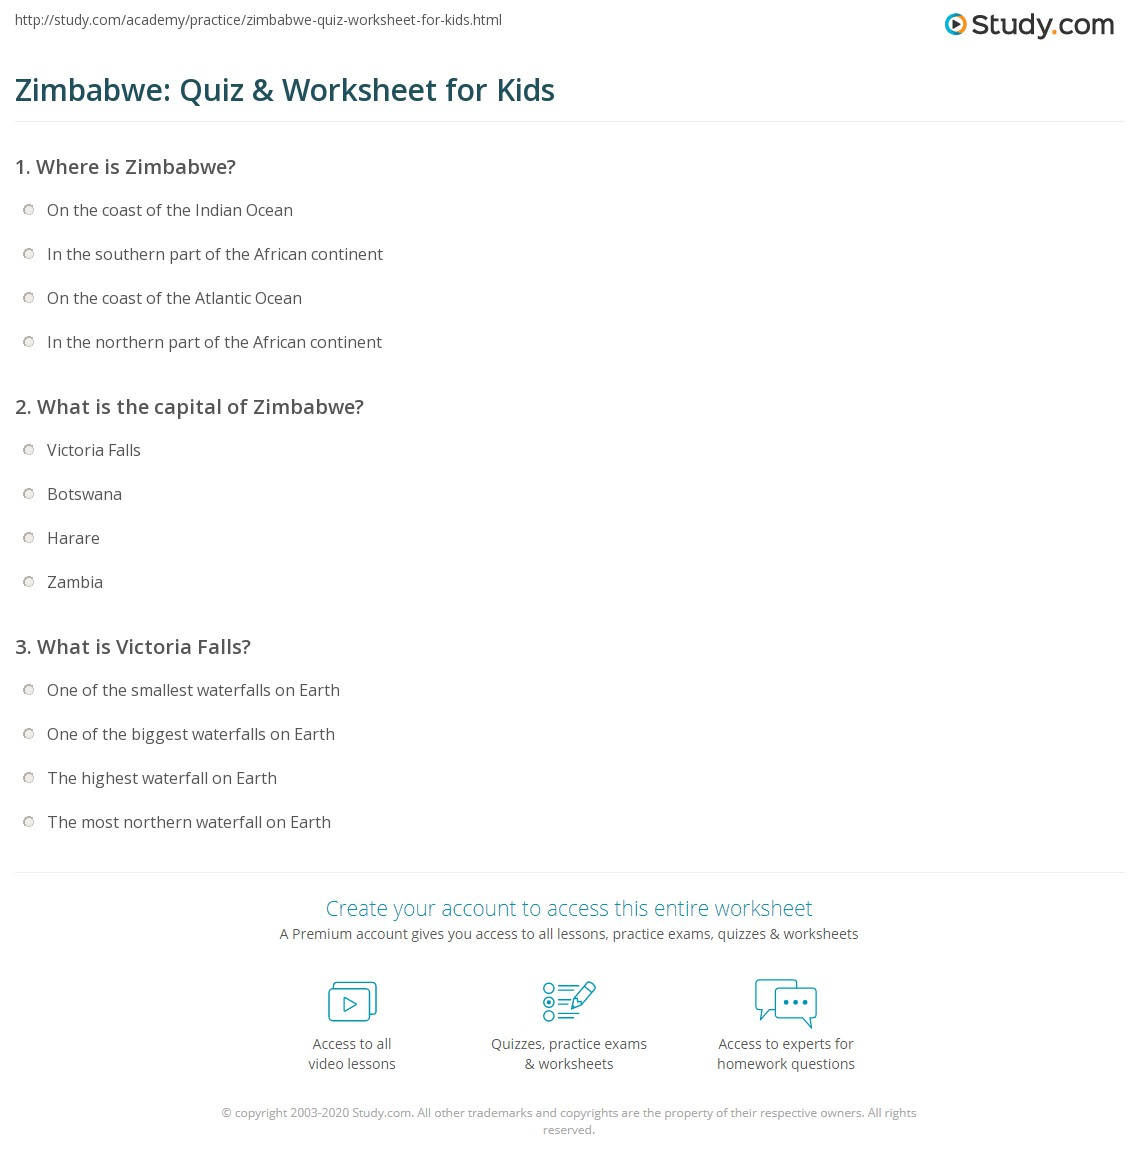 Zimbabwe Quiz Amp Worksheet For Kids